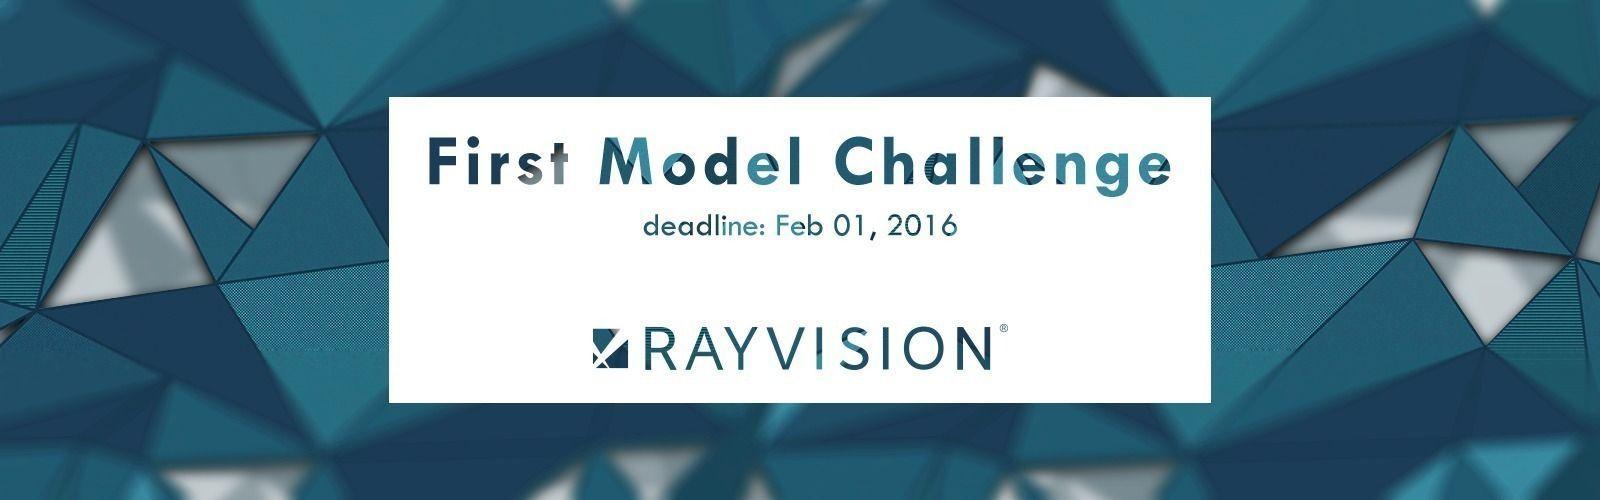 First Model Challenge